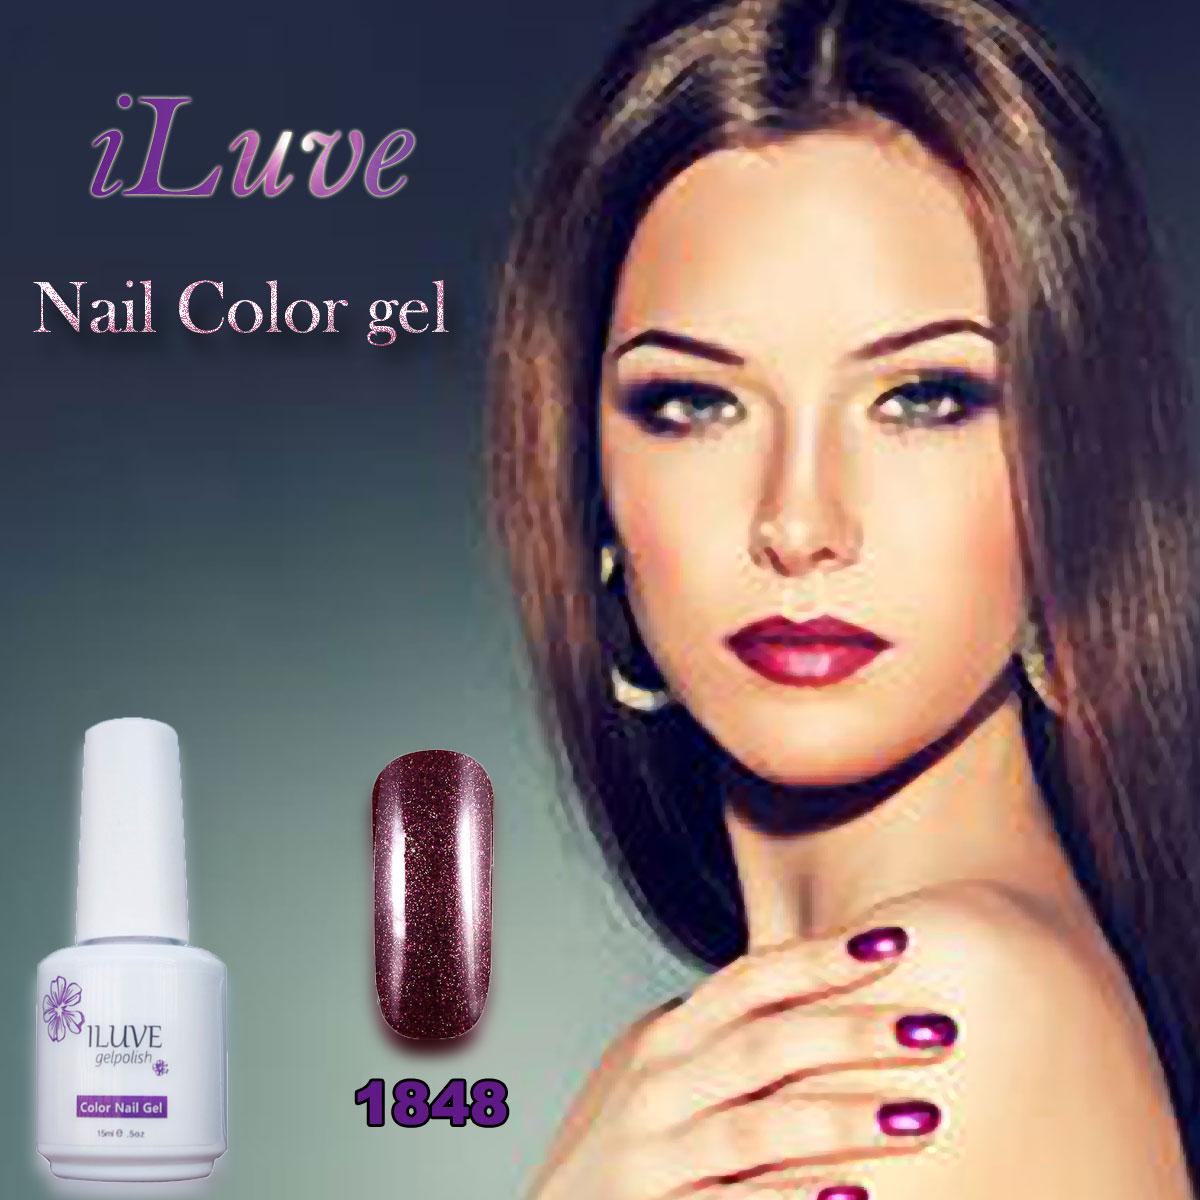 iLuve Professional Gelpolish HOT Fashion Nail Polish Soak off Nails Gel LED UV Nail Polish 15ml